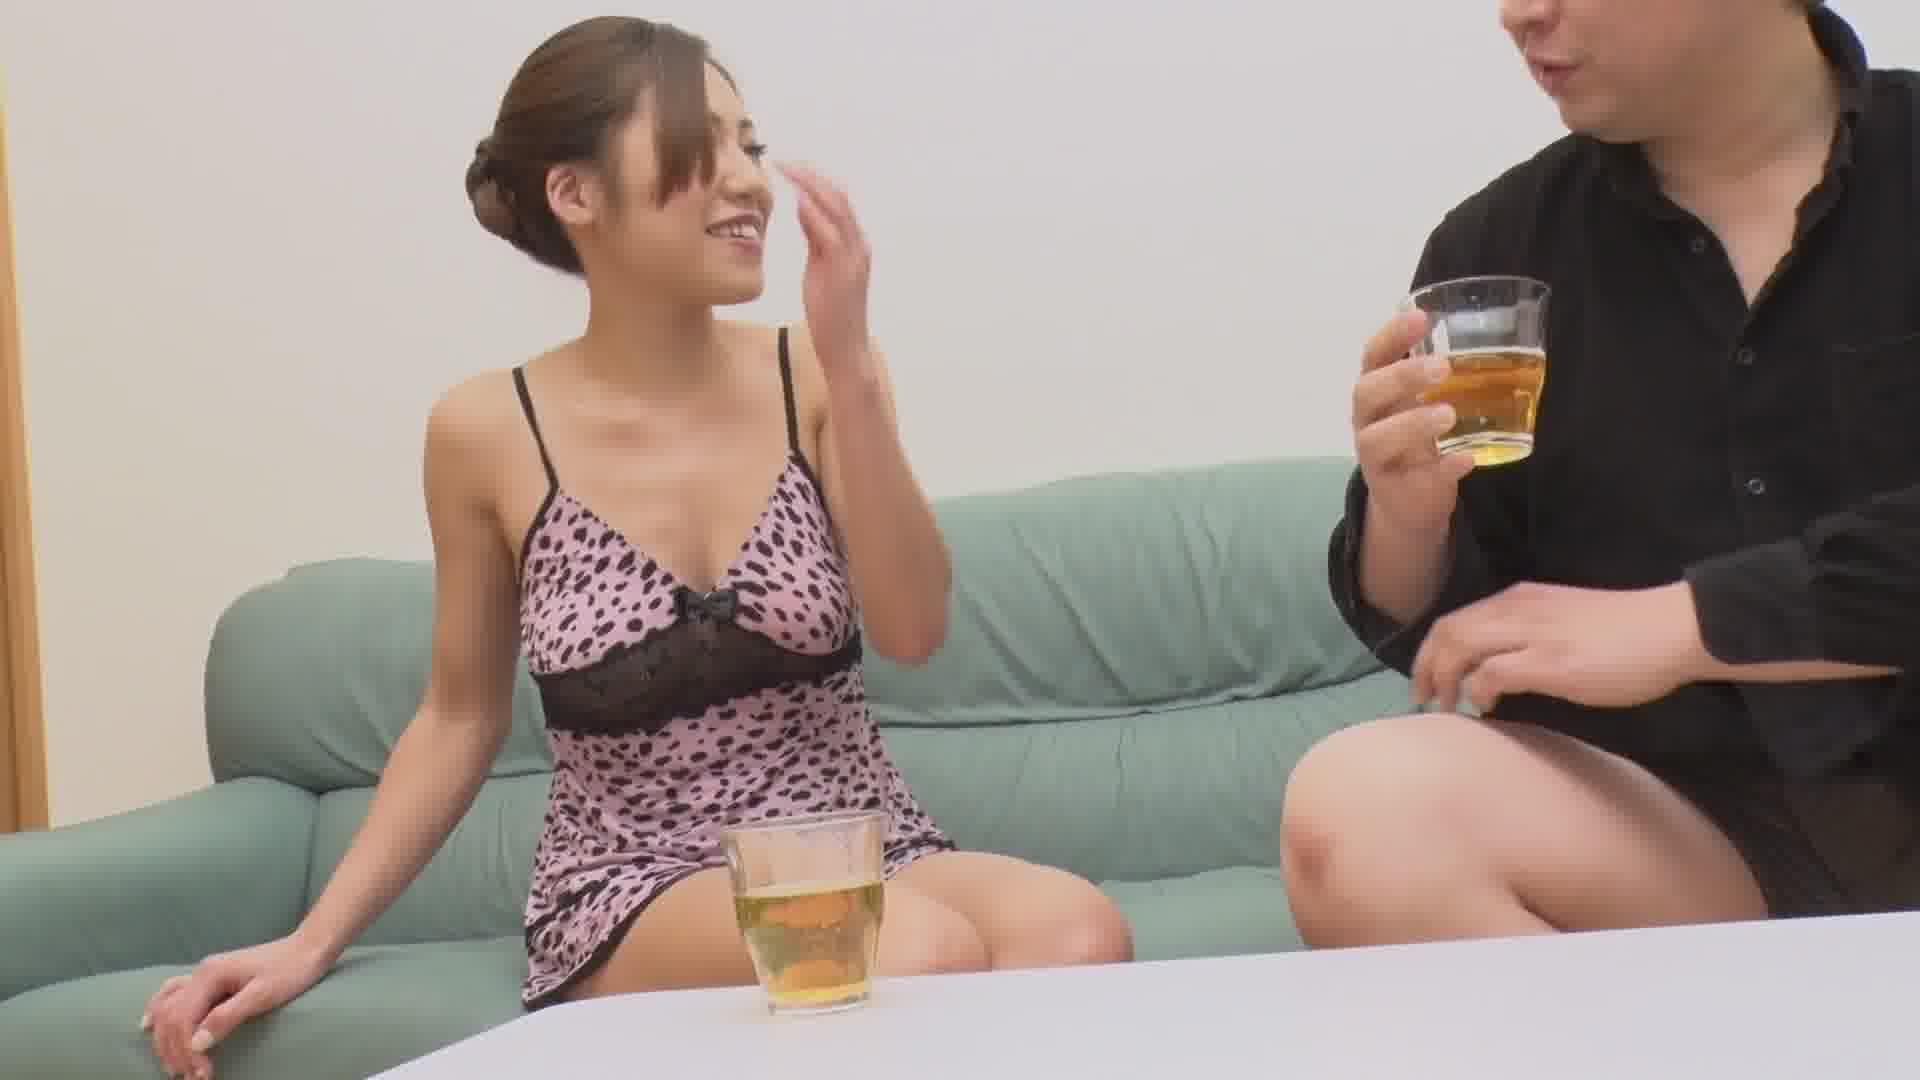 THE 未公開 ~敏感マゾ乳のすごいパイズリ5~ - 北山かんな【巨乳・パイパン・パイズリ】